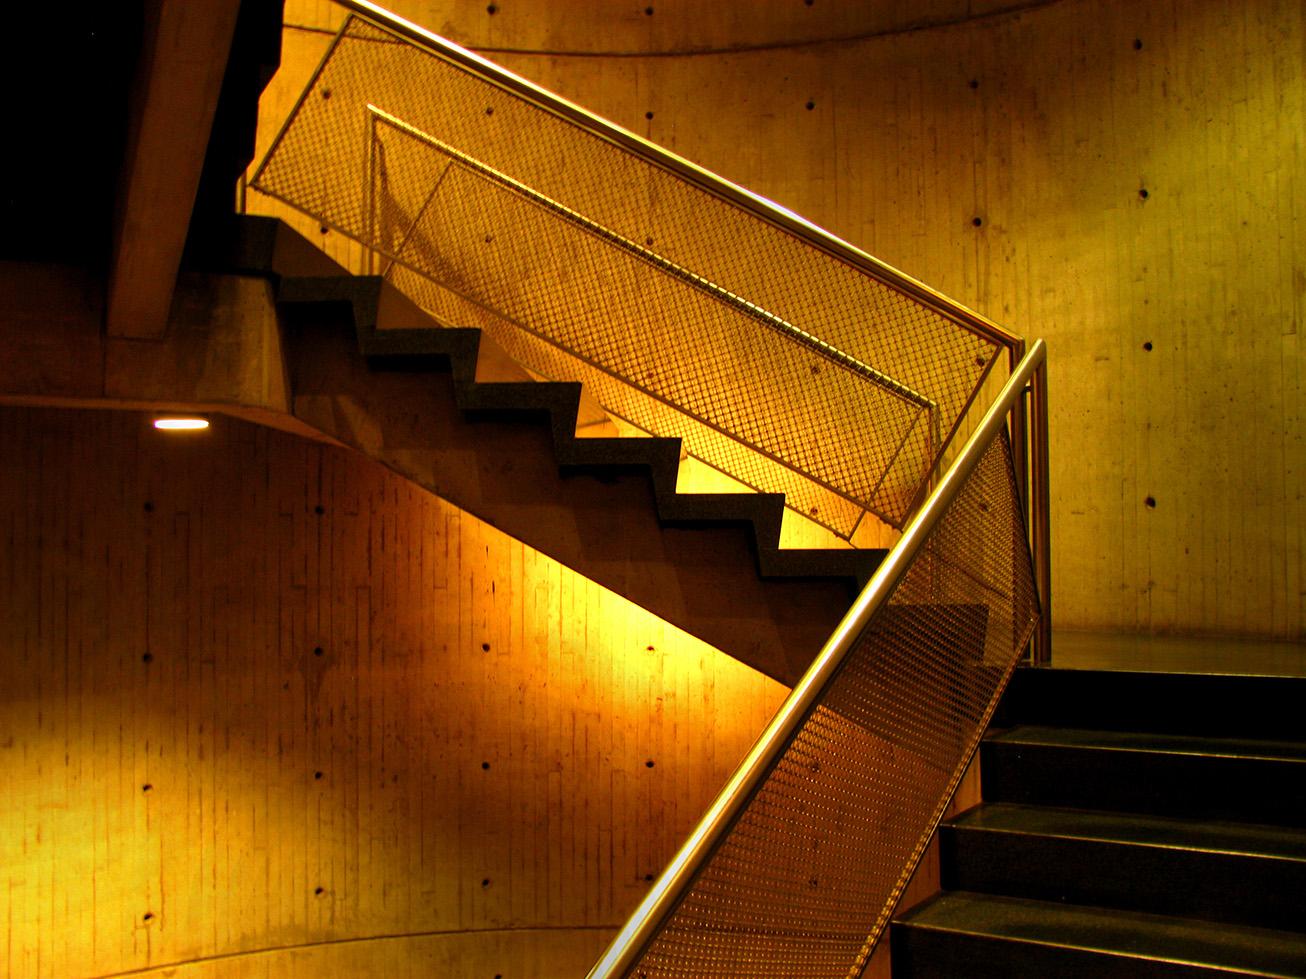 kahn_3_stair